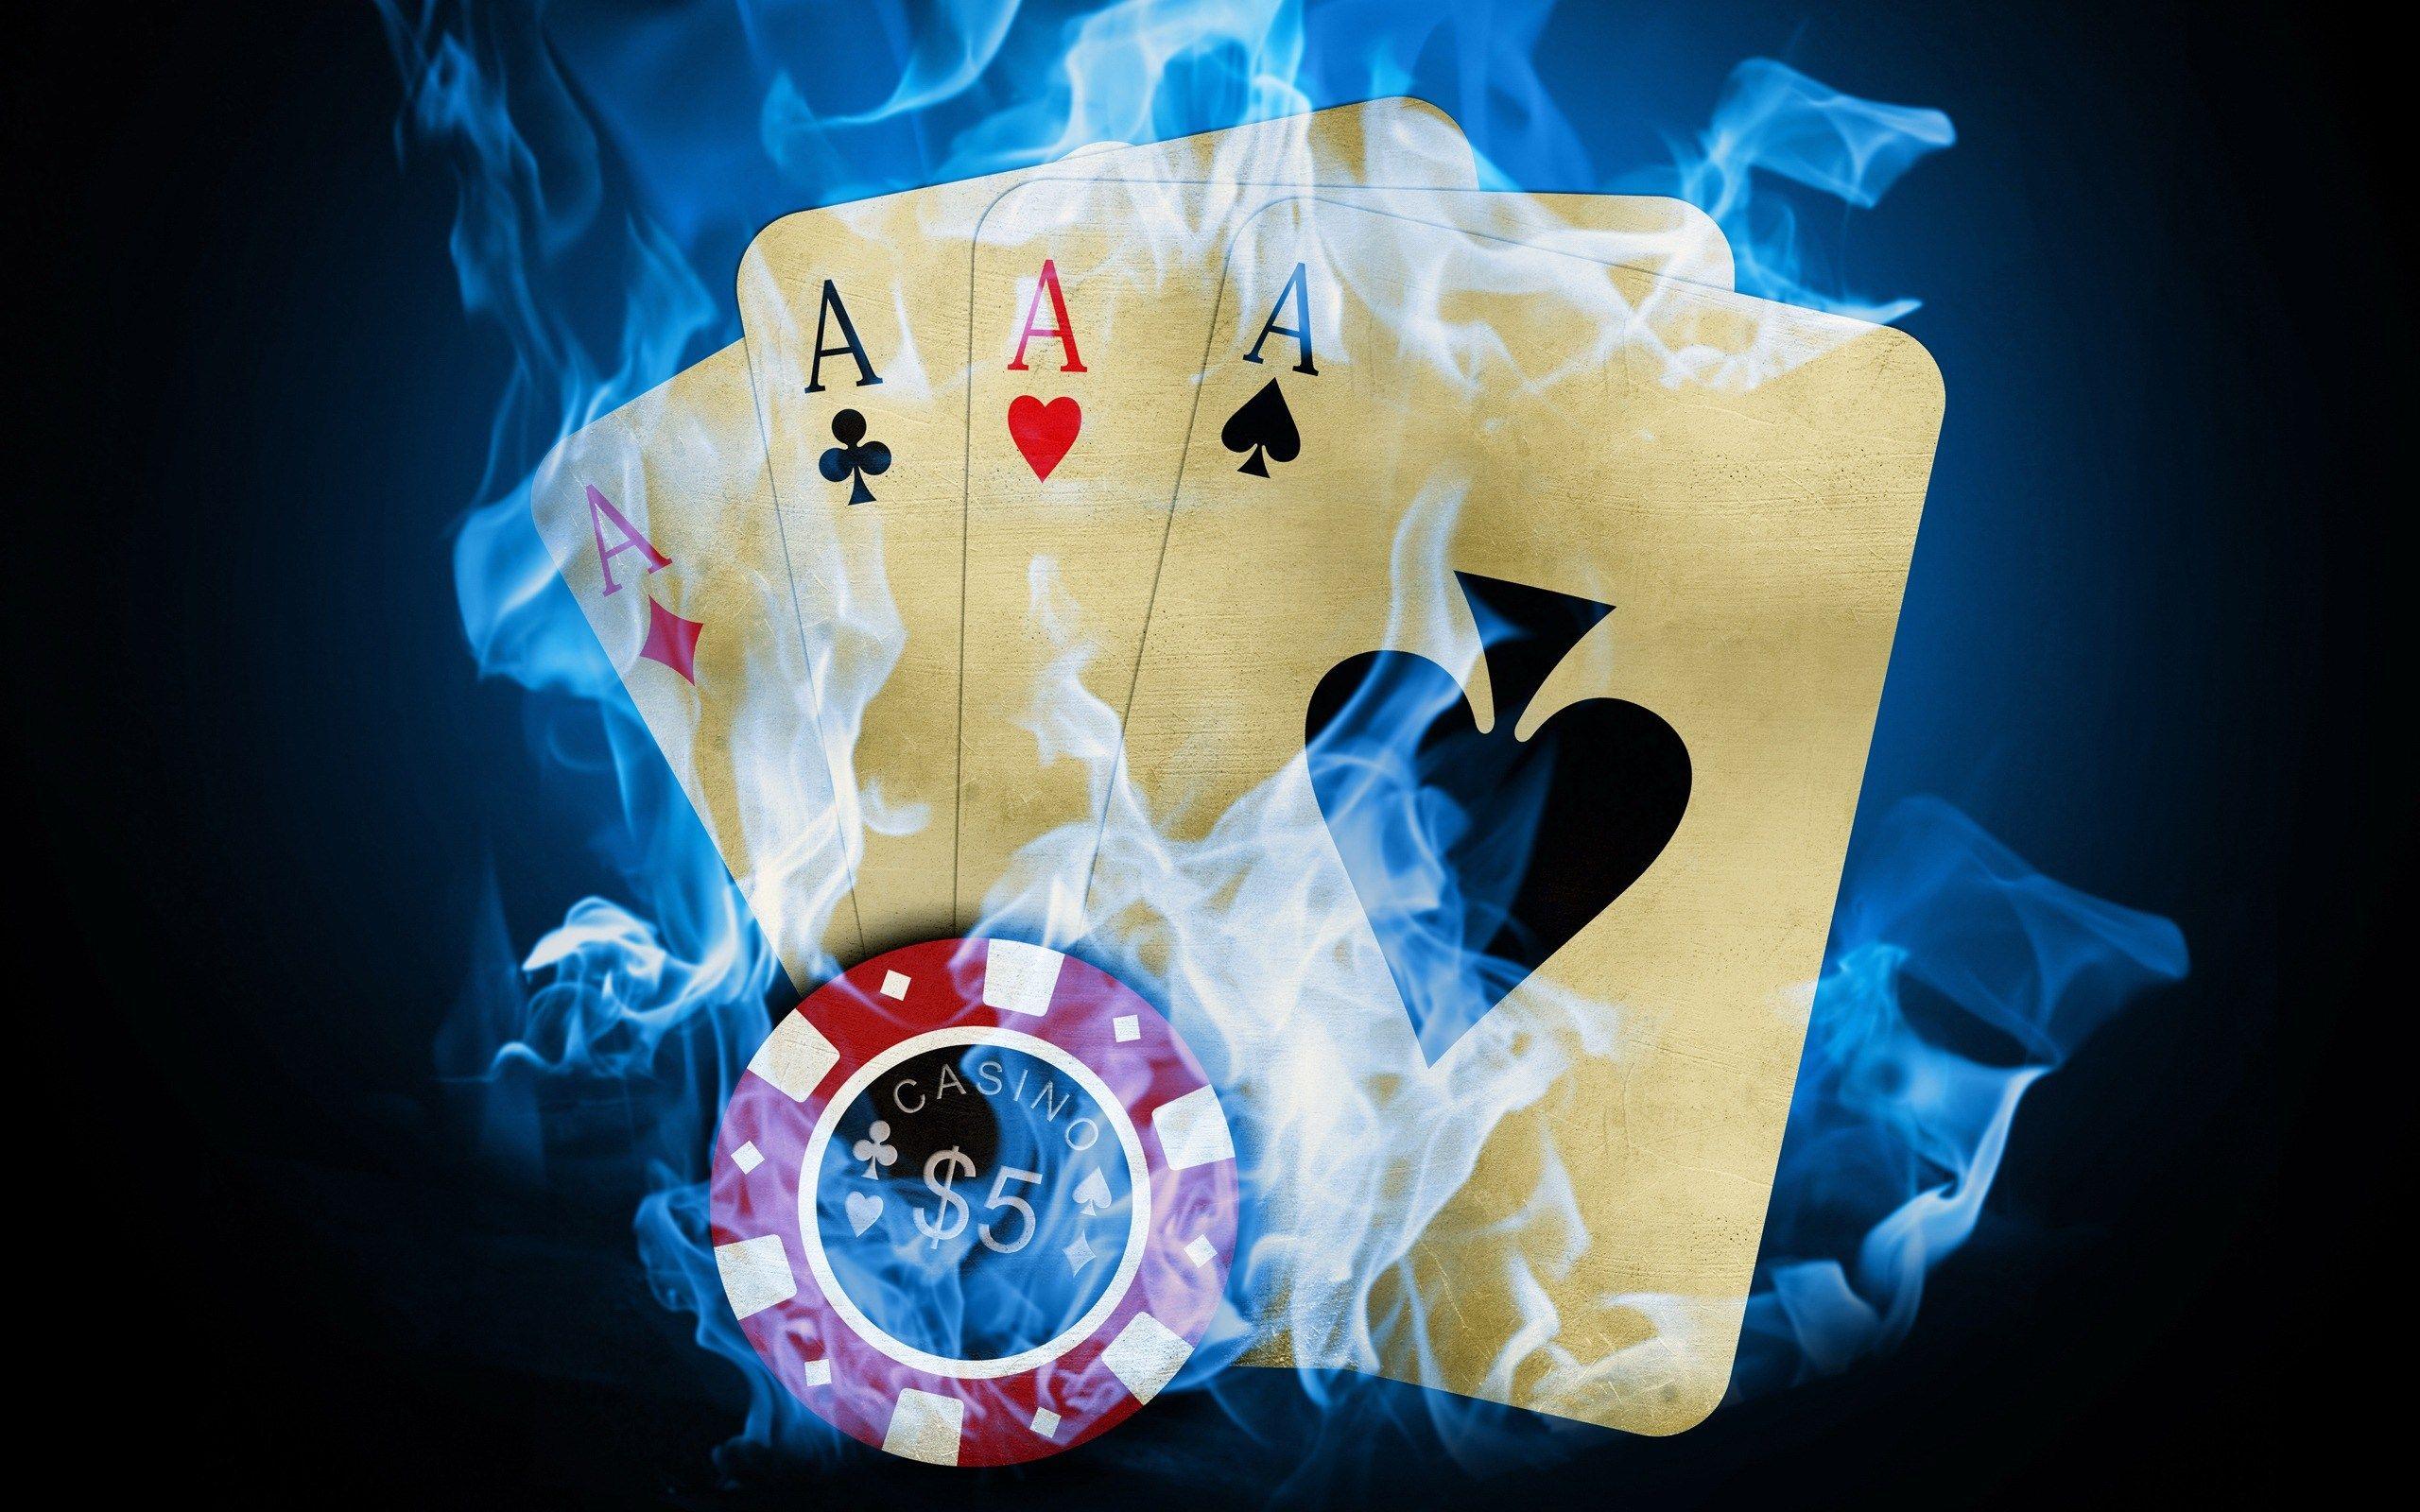 Pengenalan SeputarBandar poker online Idn Deposit Murah